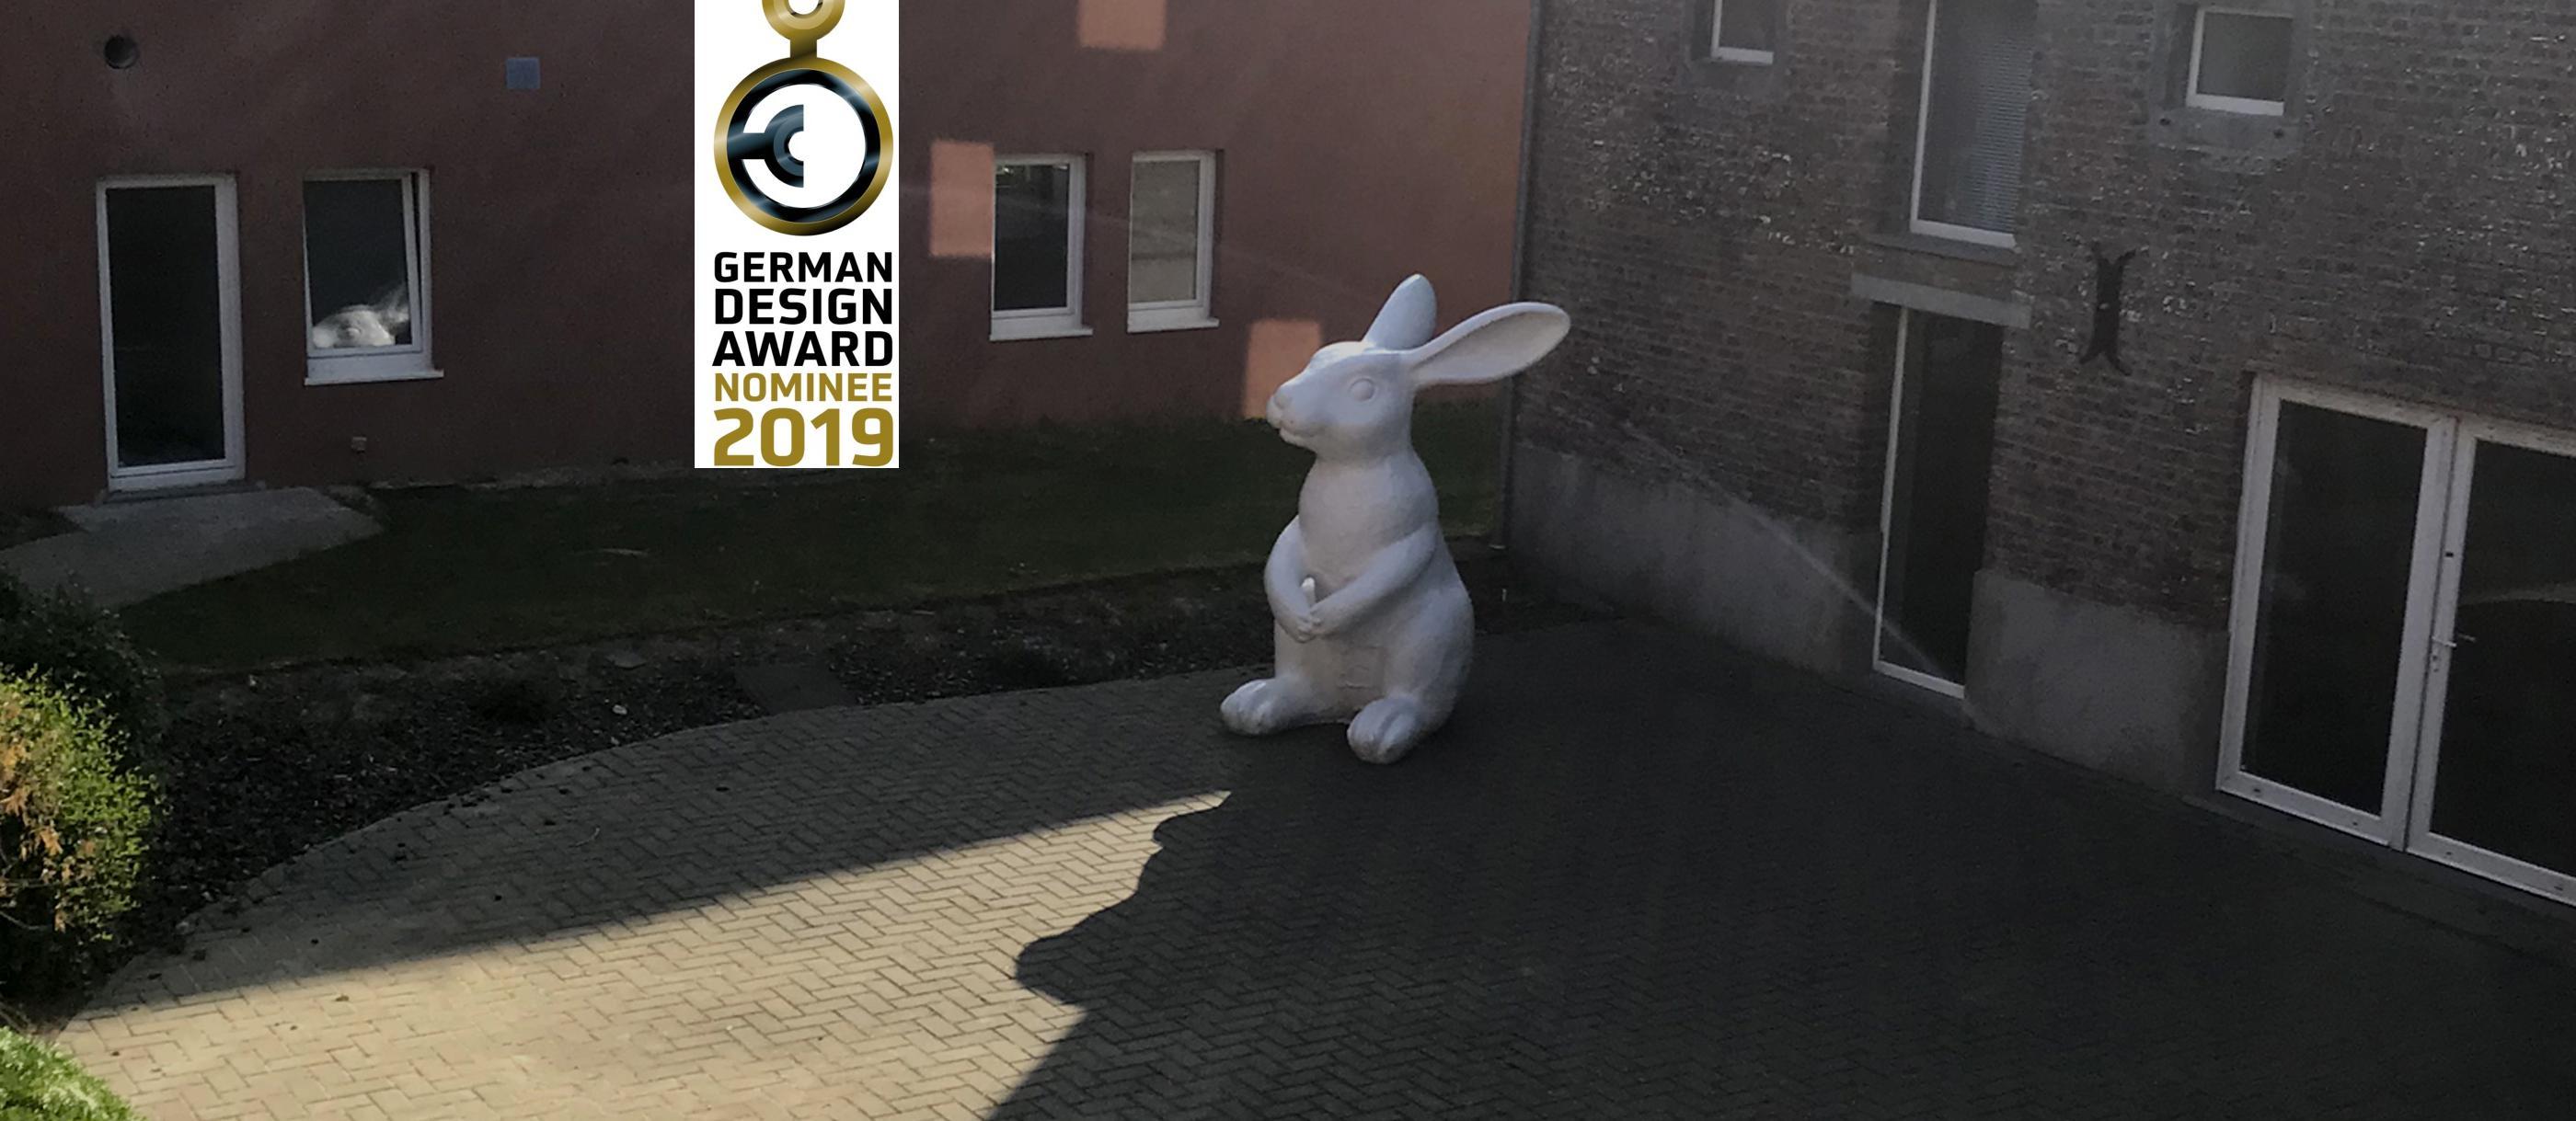 banner-blog-german-design-awards-nominee-01